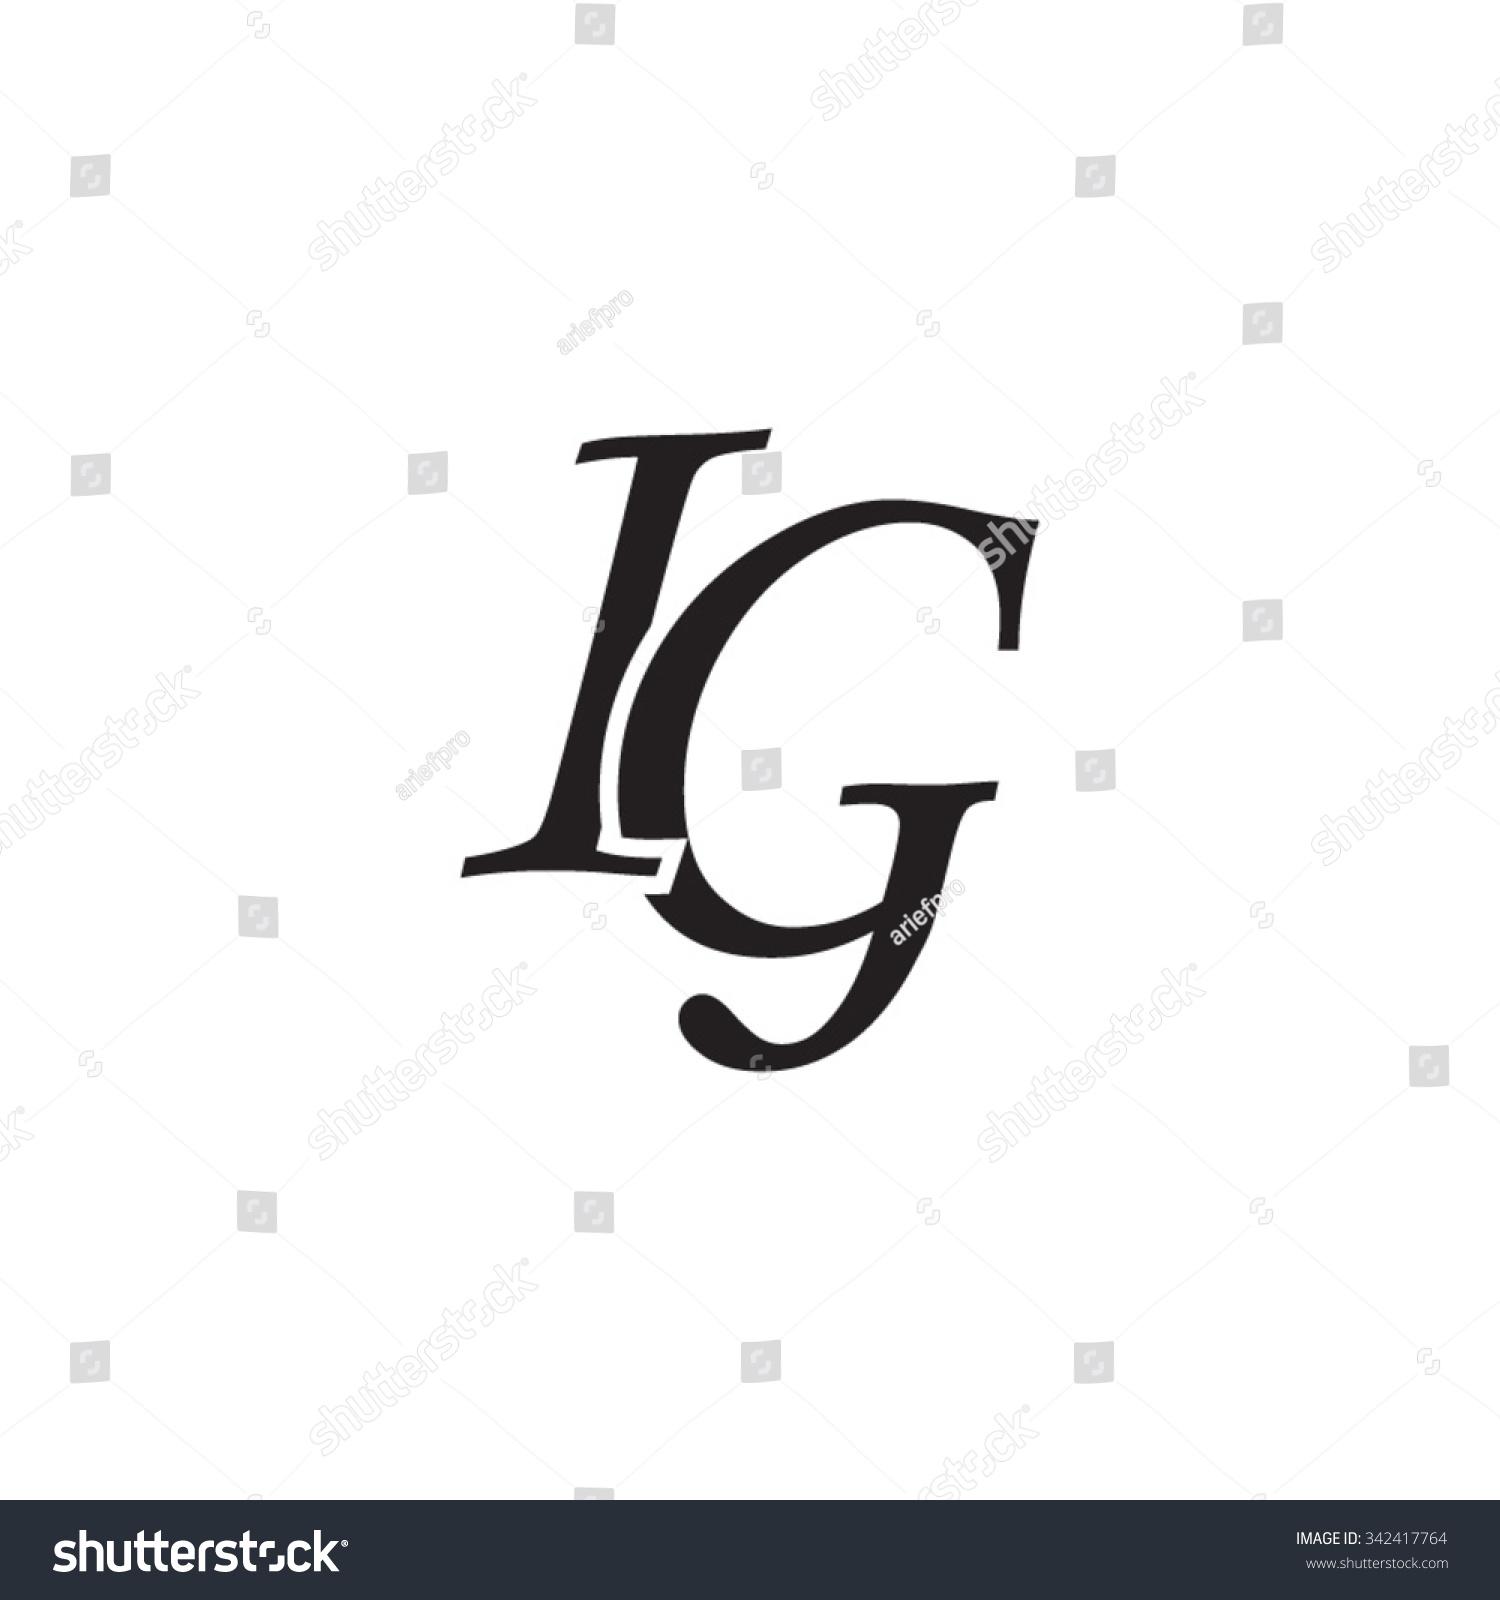 Ig Initial Monogram Logo Stock Vector Royalty Free 342417764